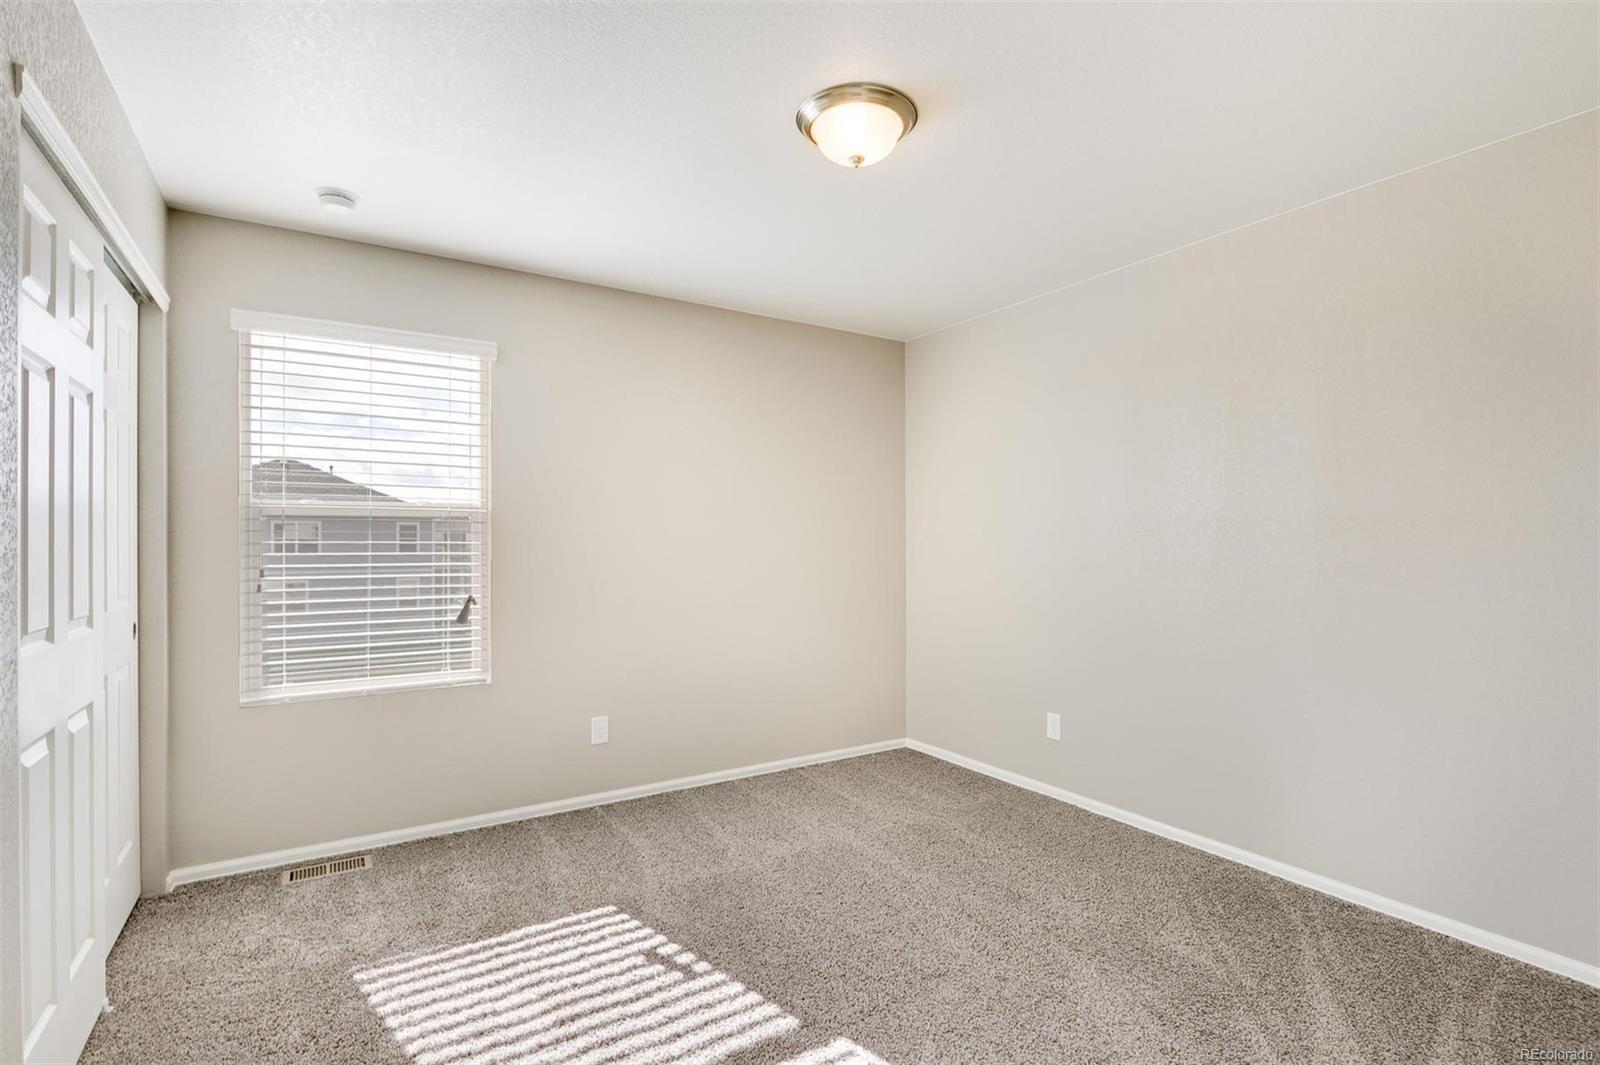 MLS# 2164790 - 1 - 1674  Whiteley Drive, Windsor, CO 80550